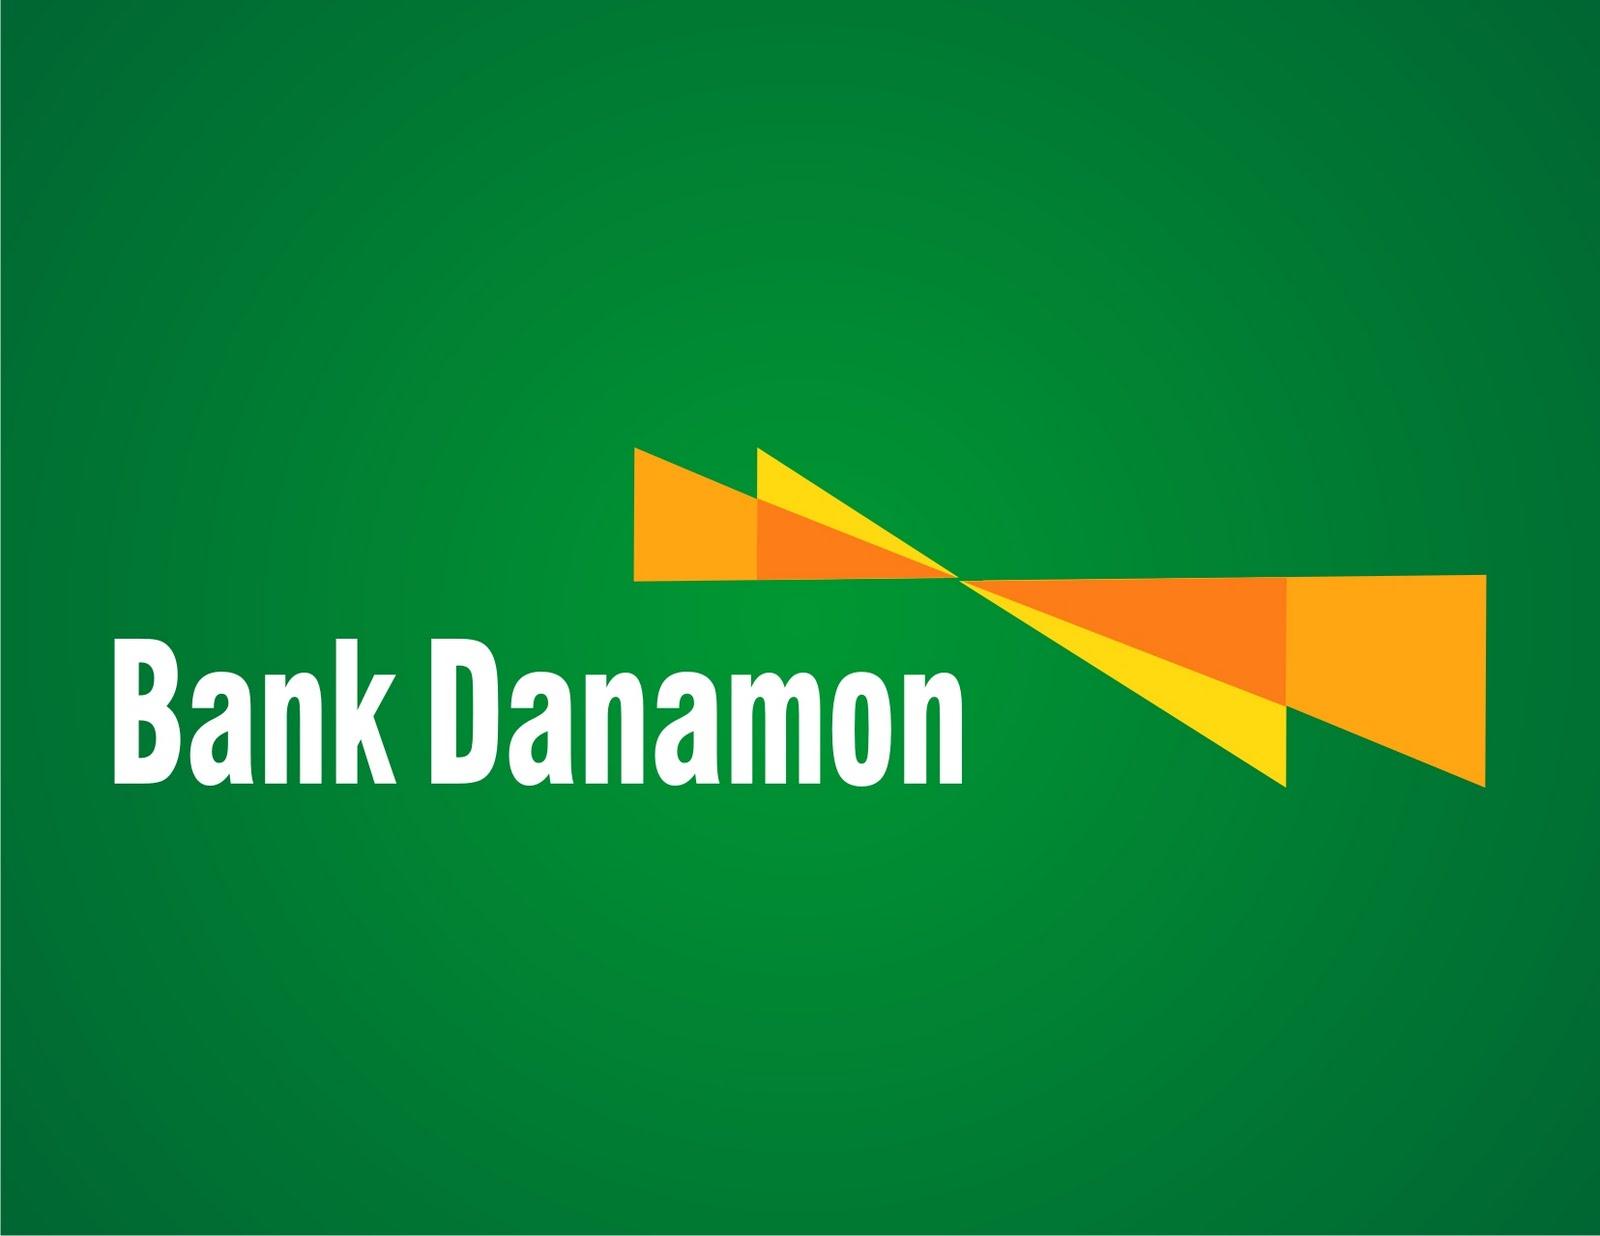 bank danamon logo